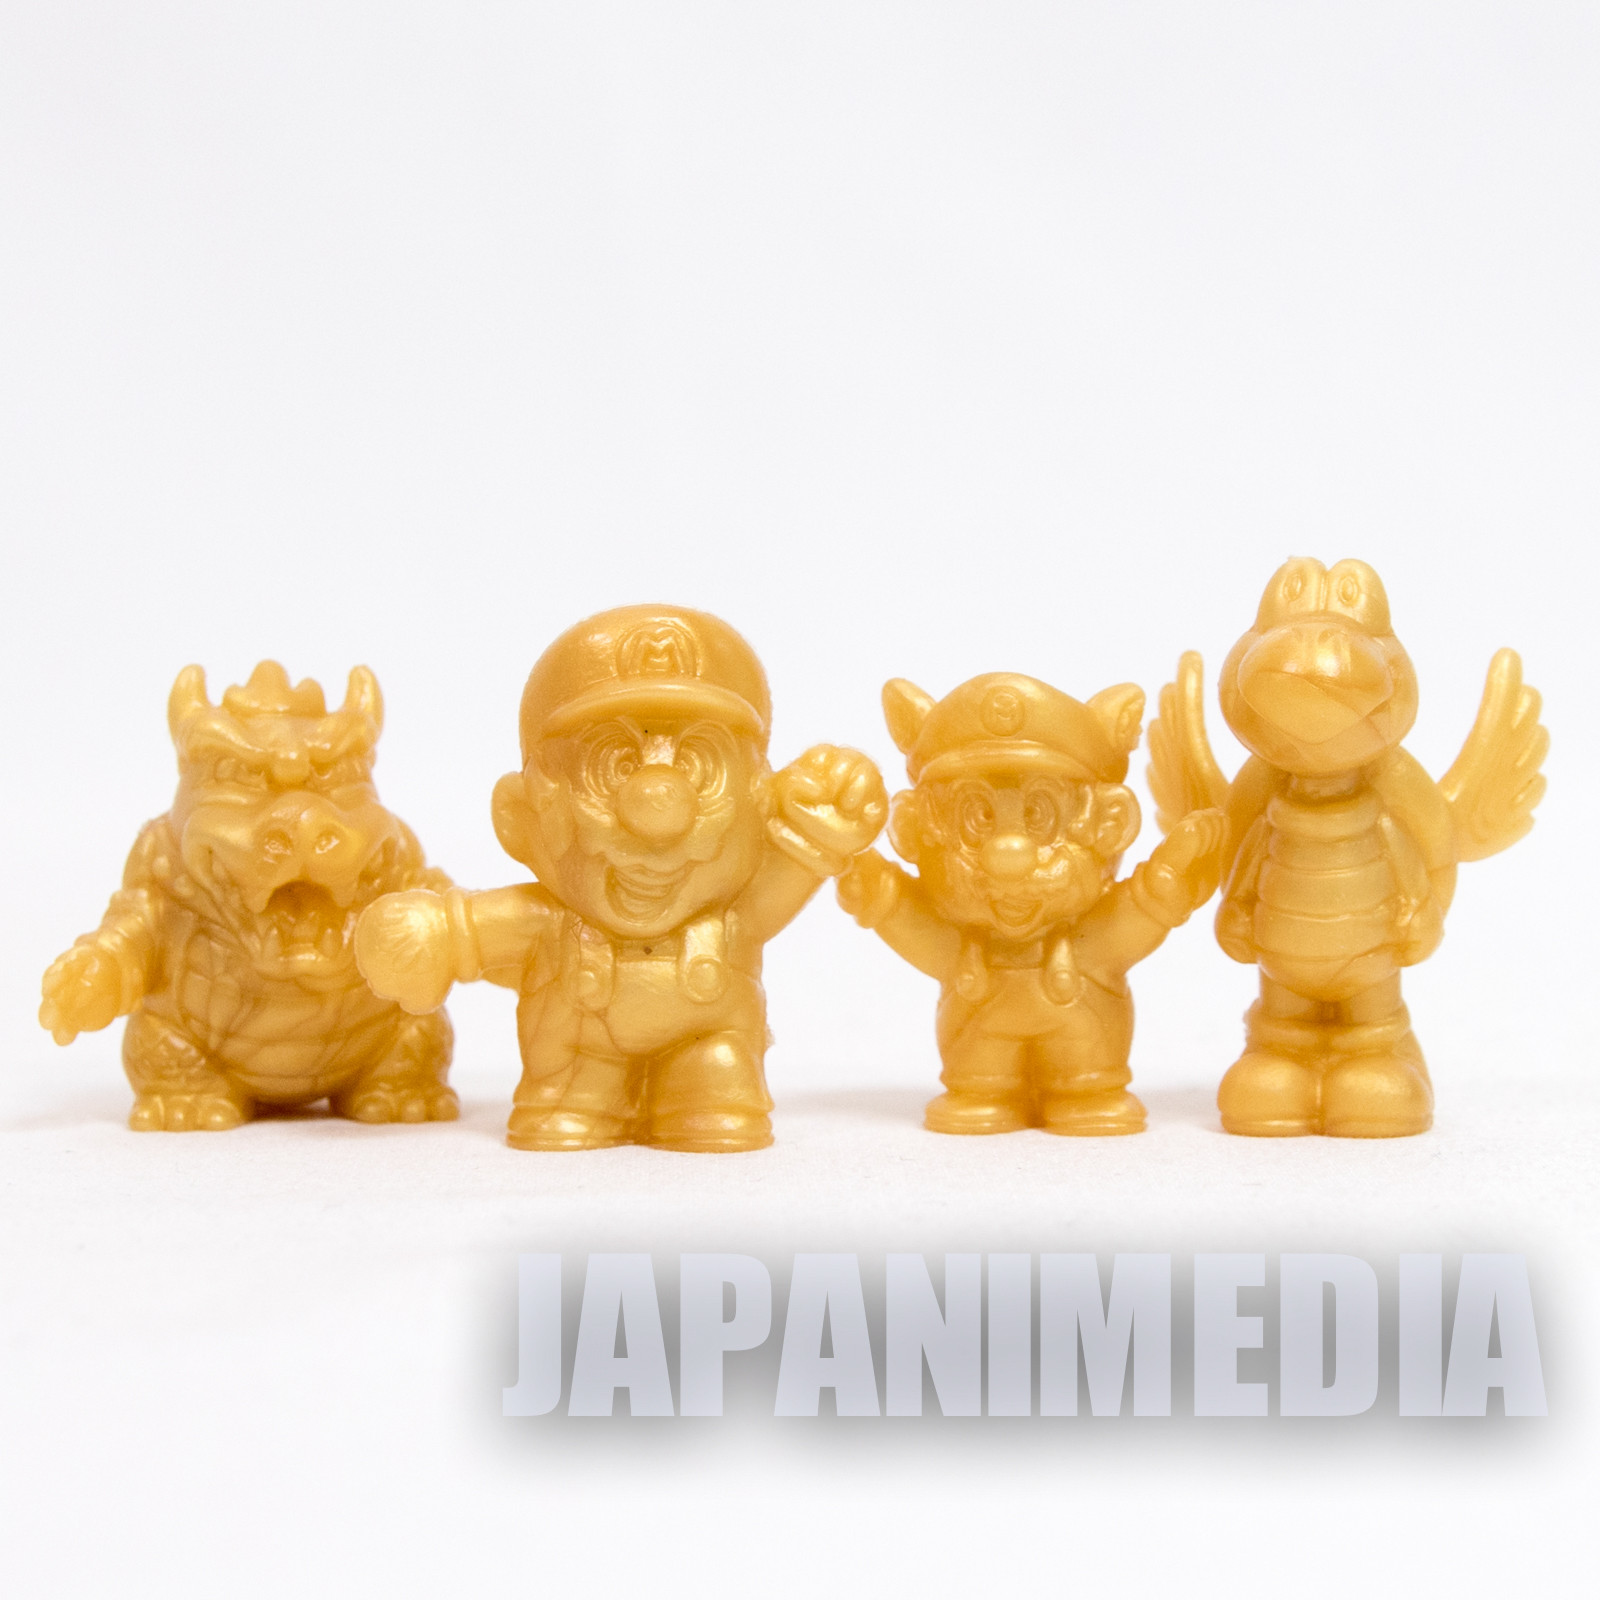 Retro Super Mario Mini Figure 4pc Set Nintendo JAPAN